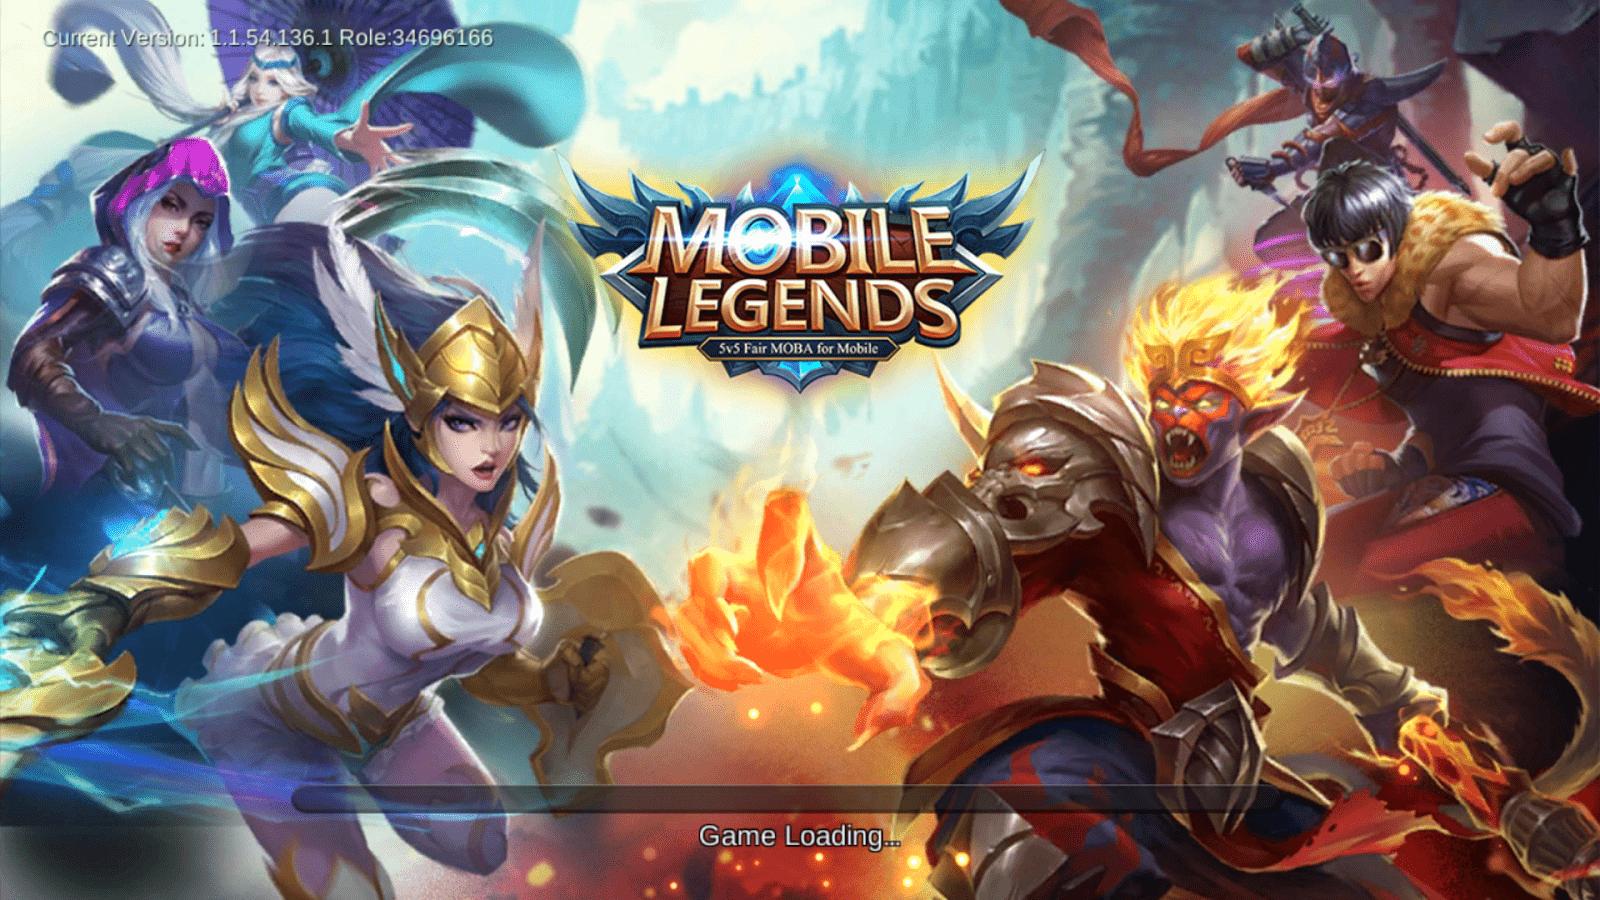 Mobile Legends Wallpapers Top Free Mobile Legends